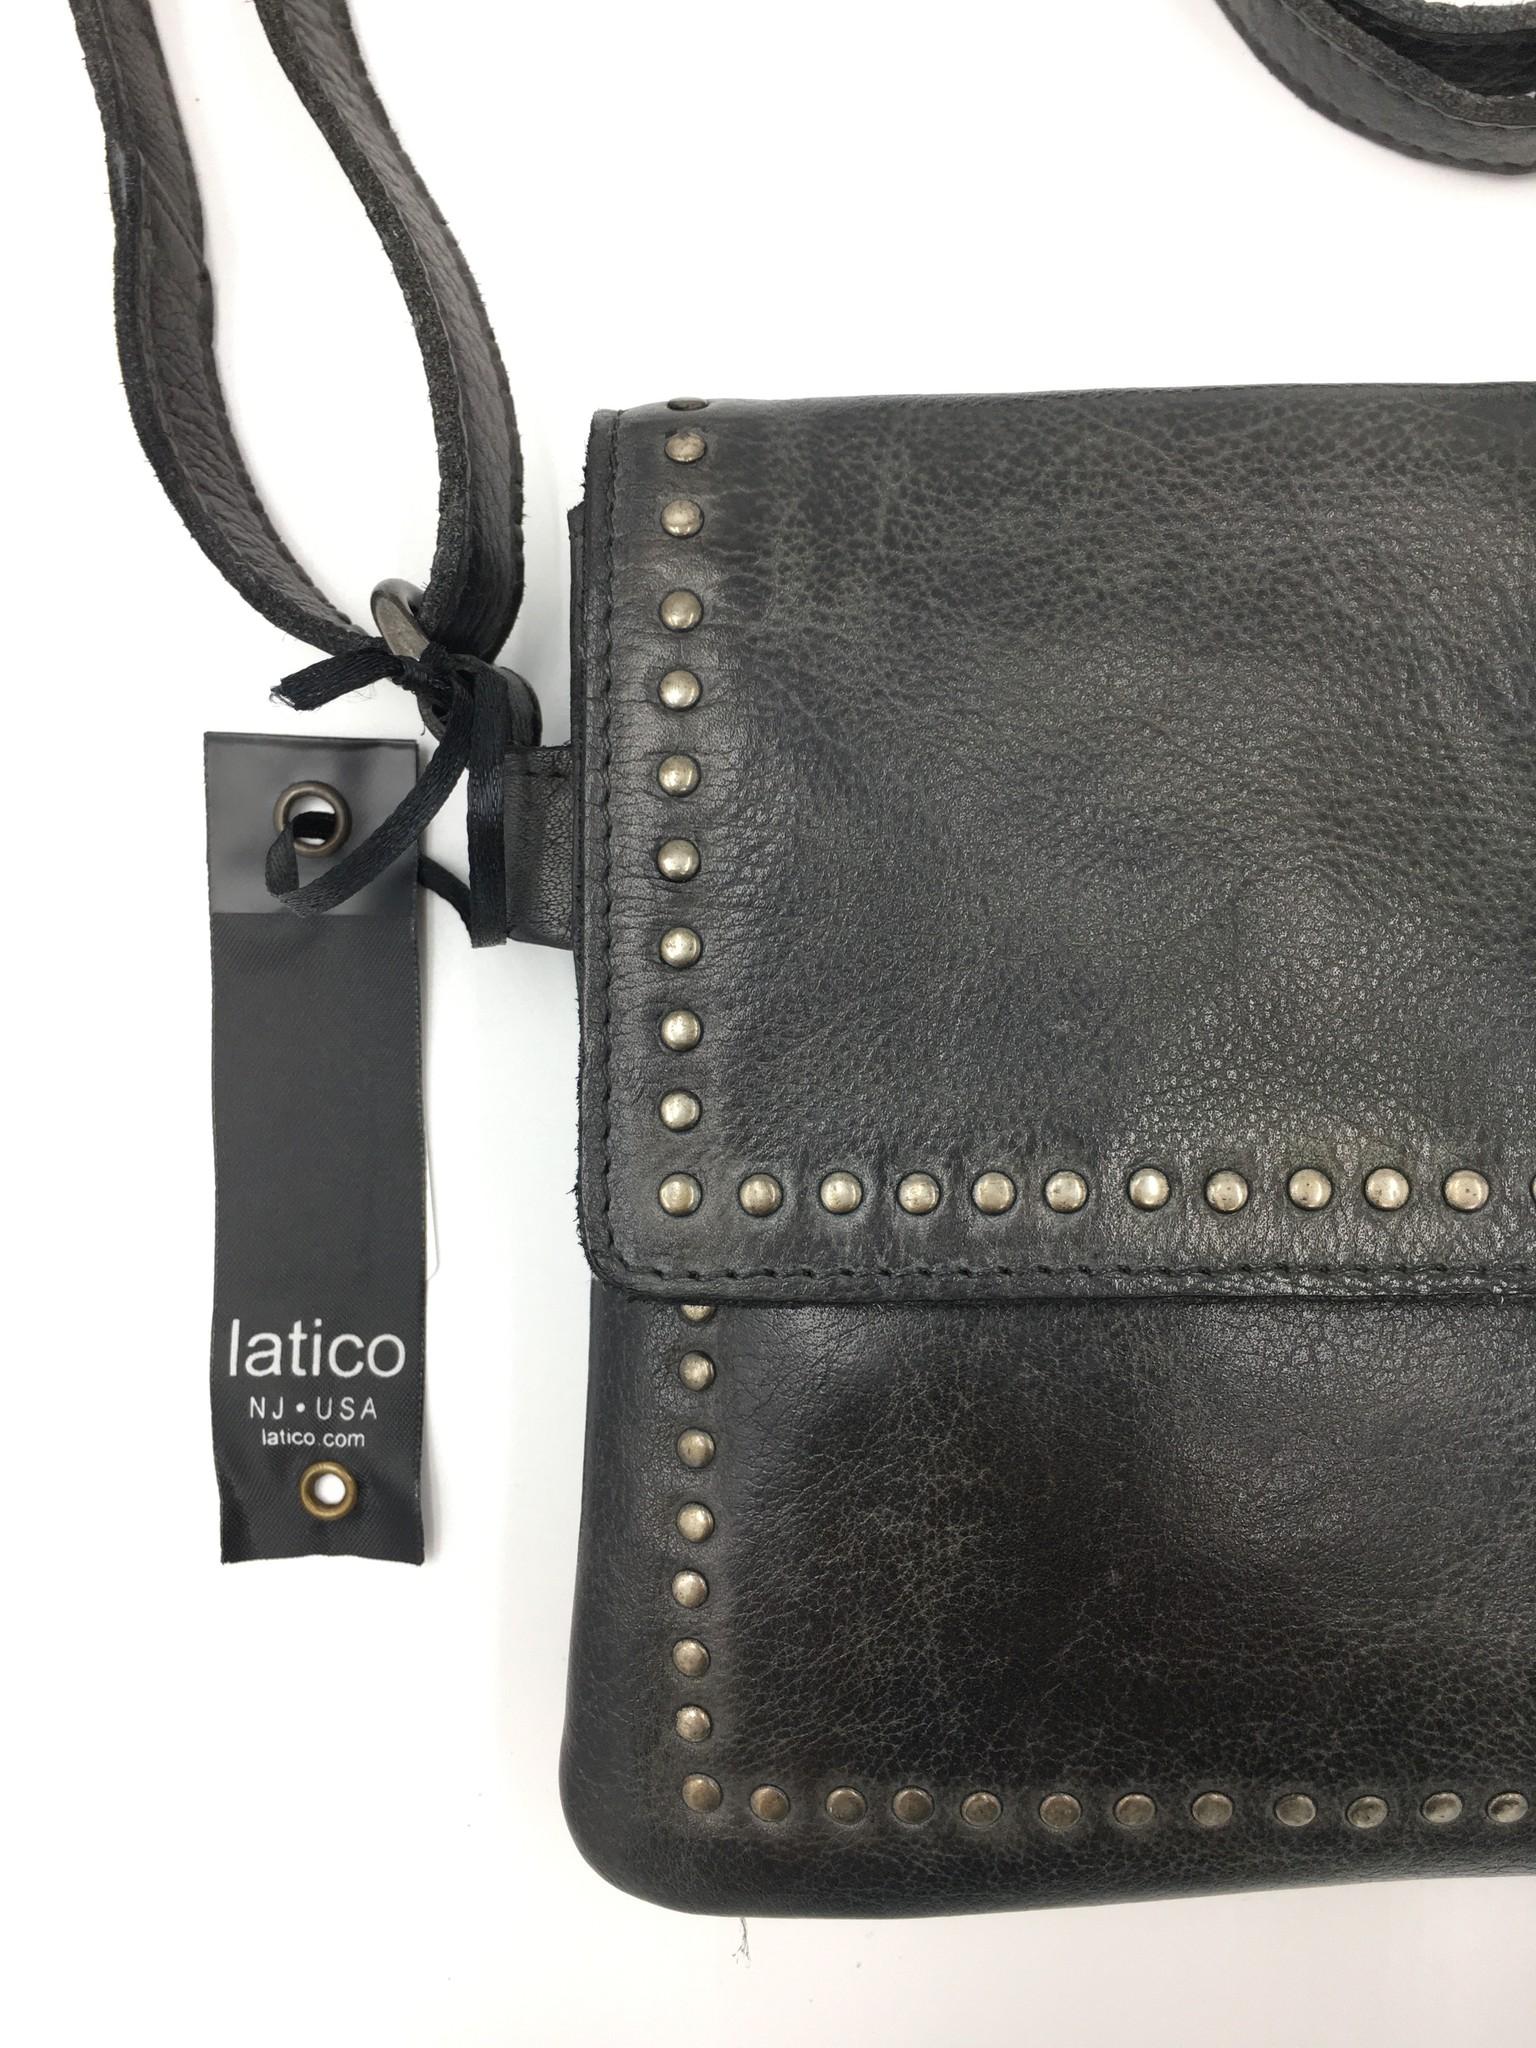 Latico Latico Cleo - Charcoal